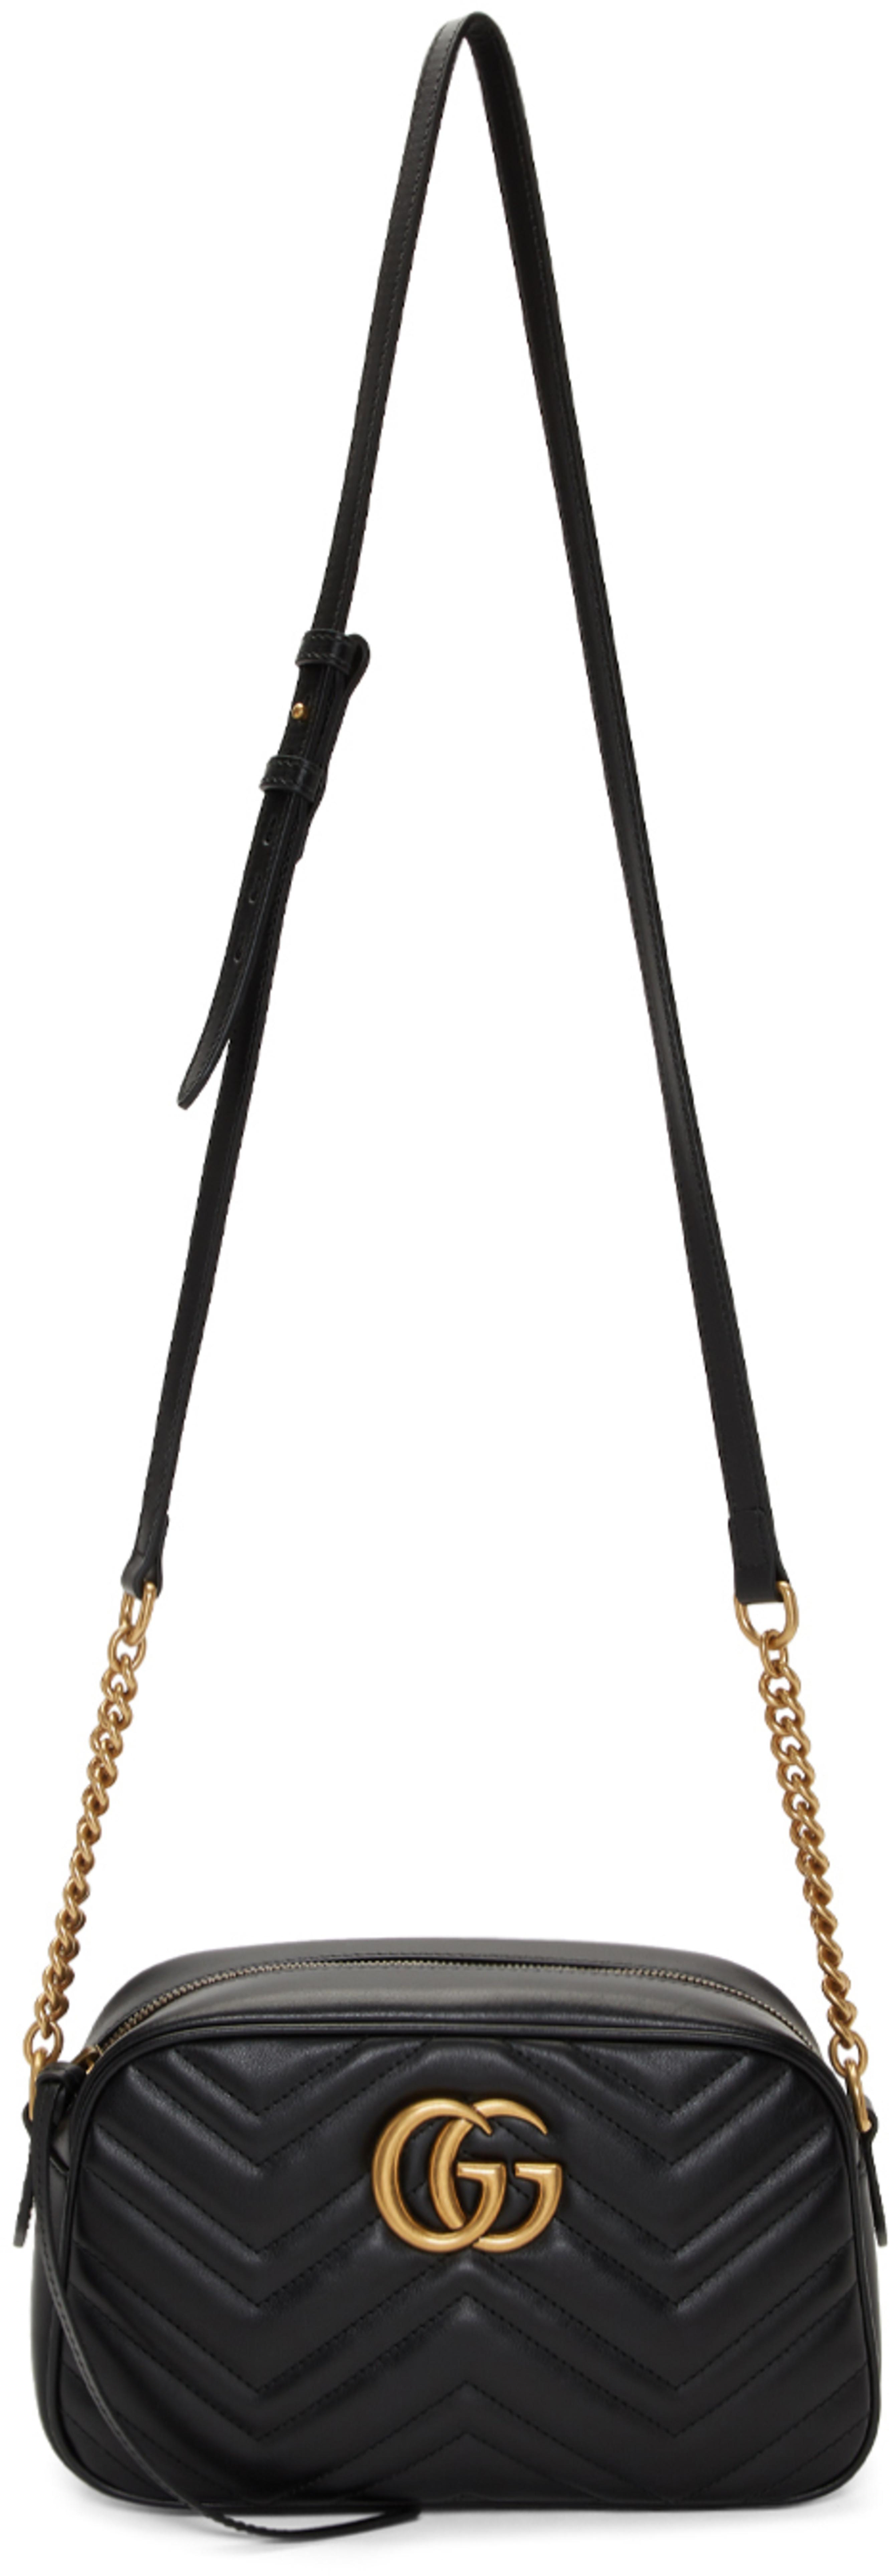 0e4b48a10014 Gucci shoulder bags for Women | SSENSE Canada